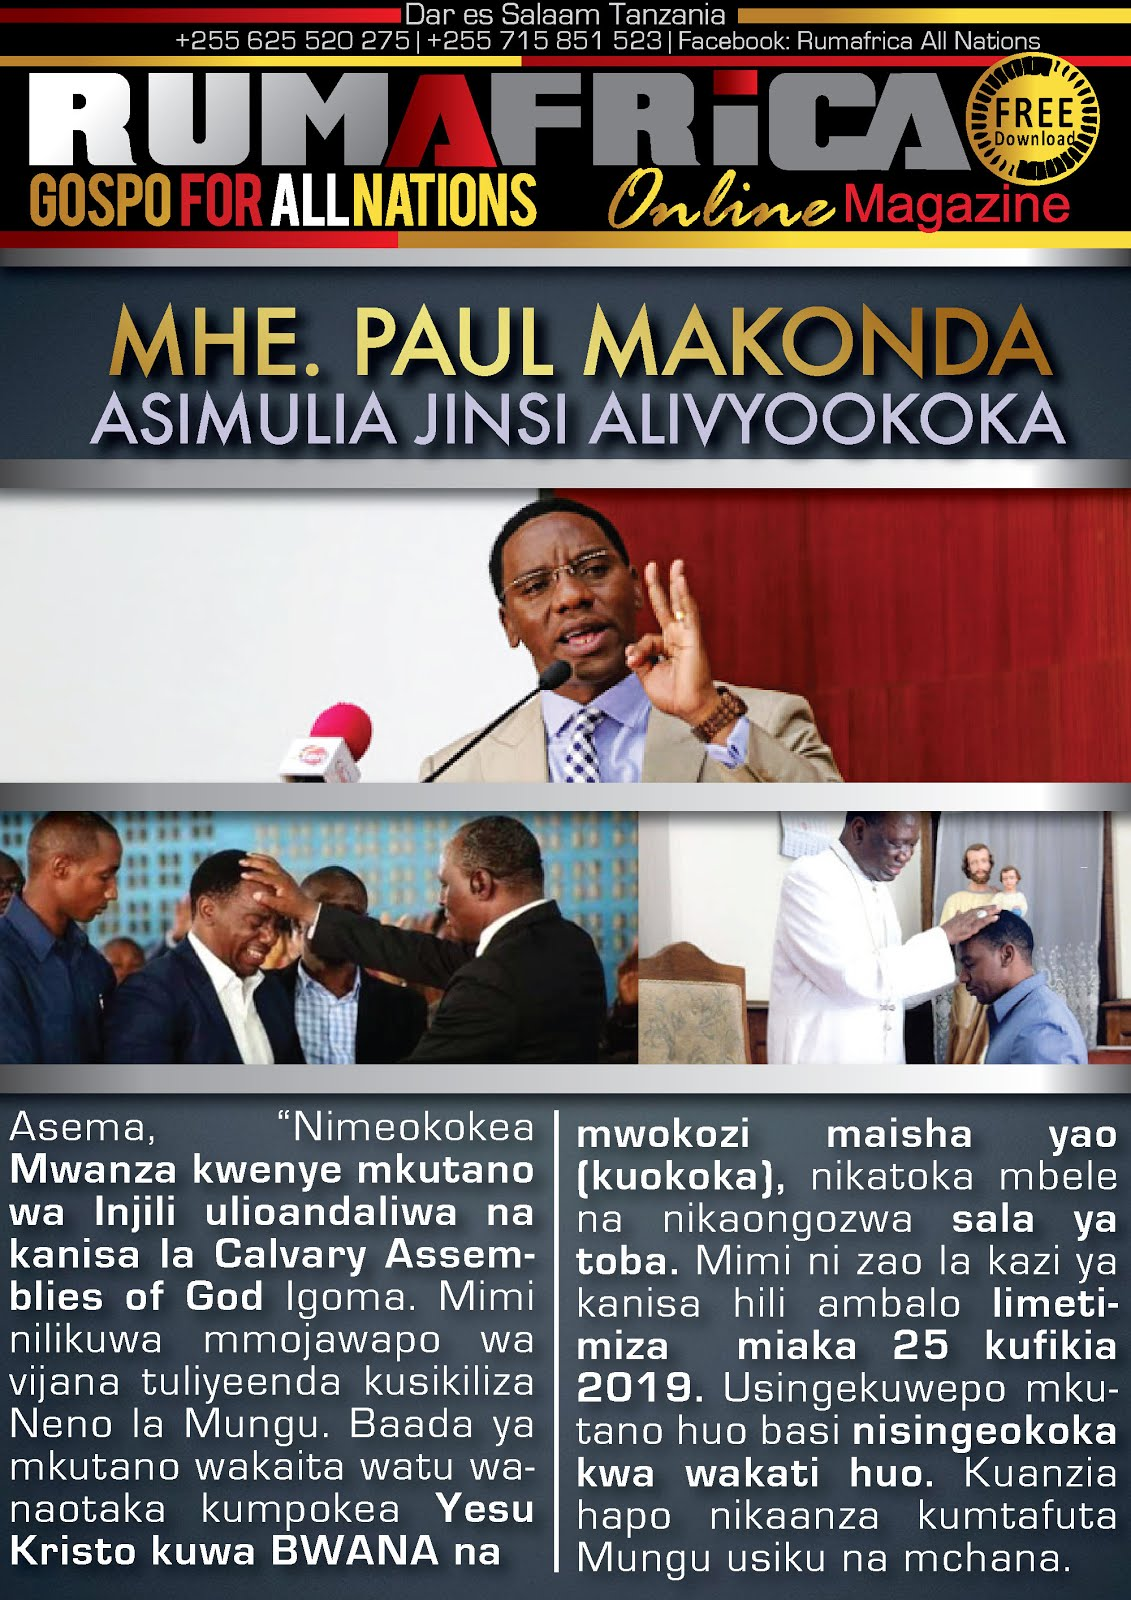 MHE. PAUL MAKONDA